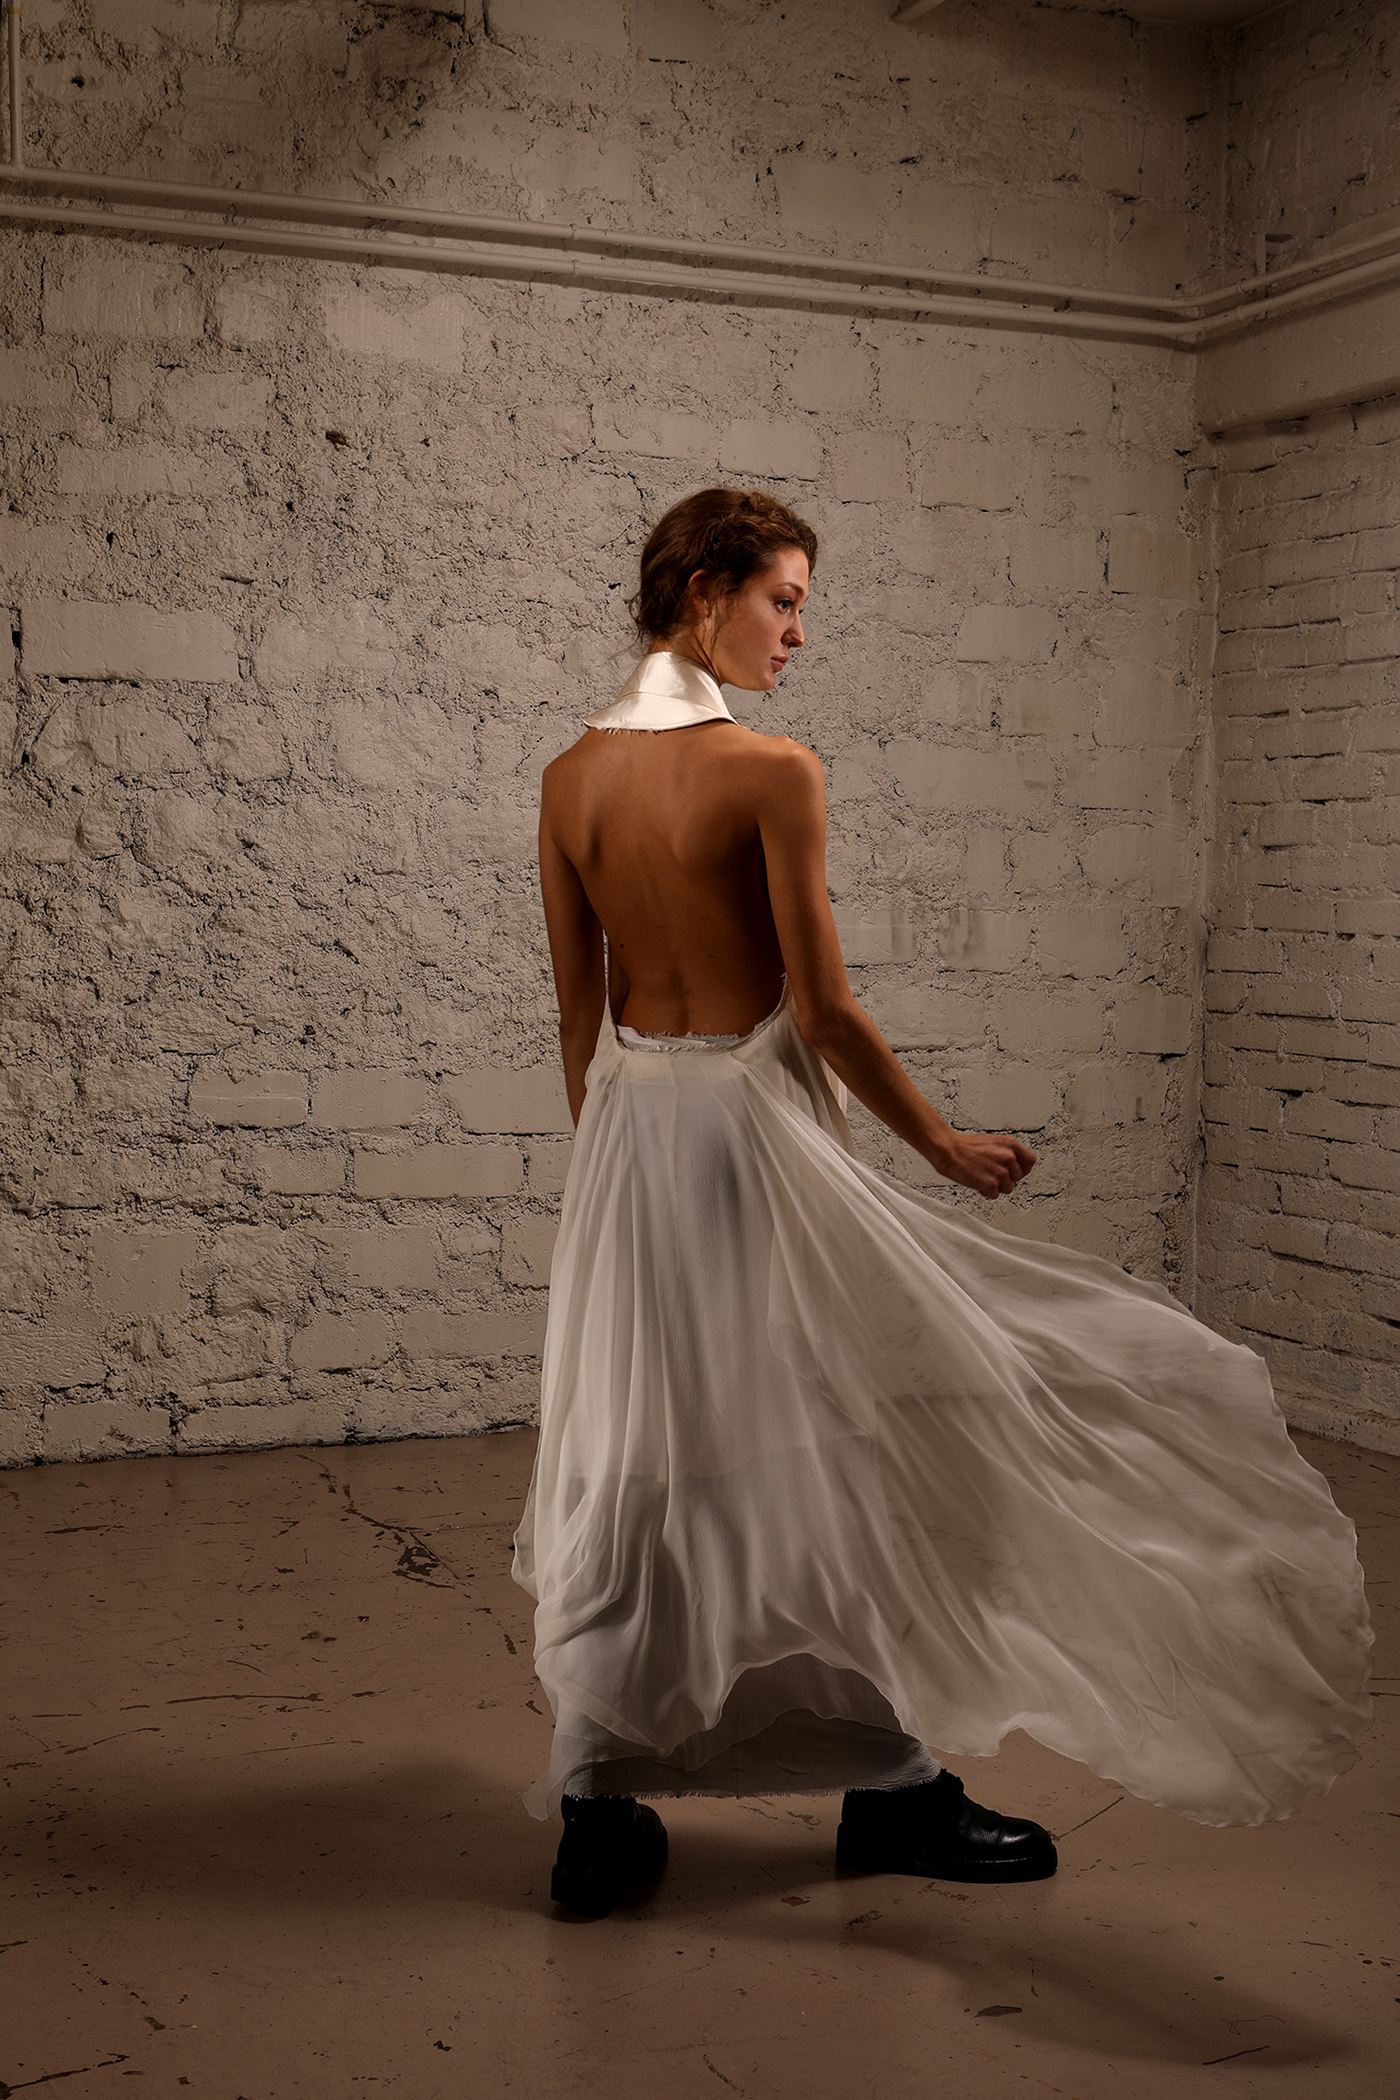 Image may contain: dress, wall and wedding dress